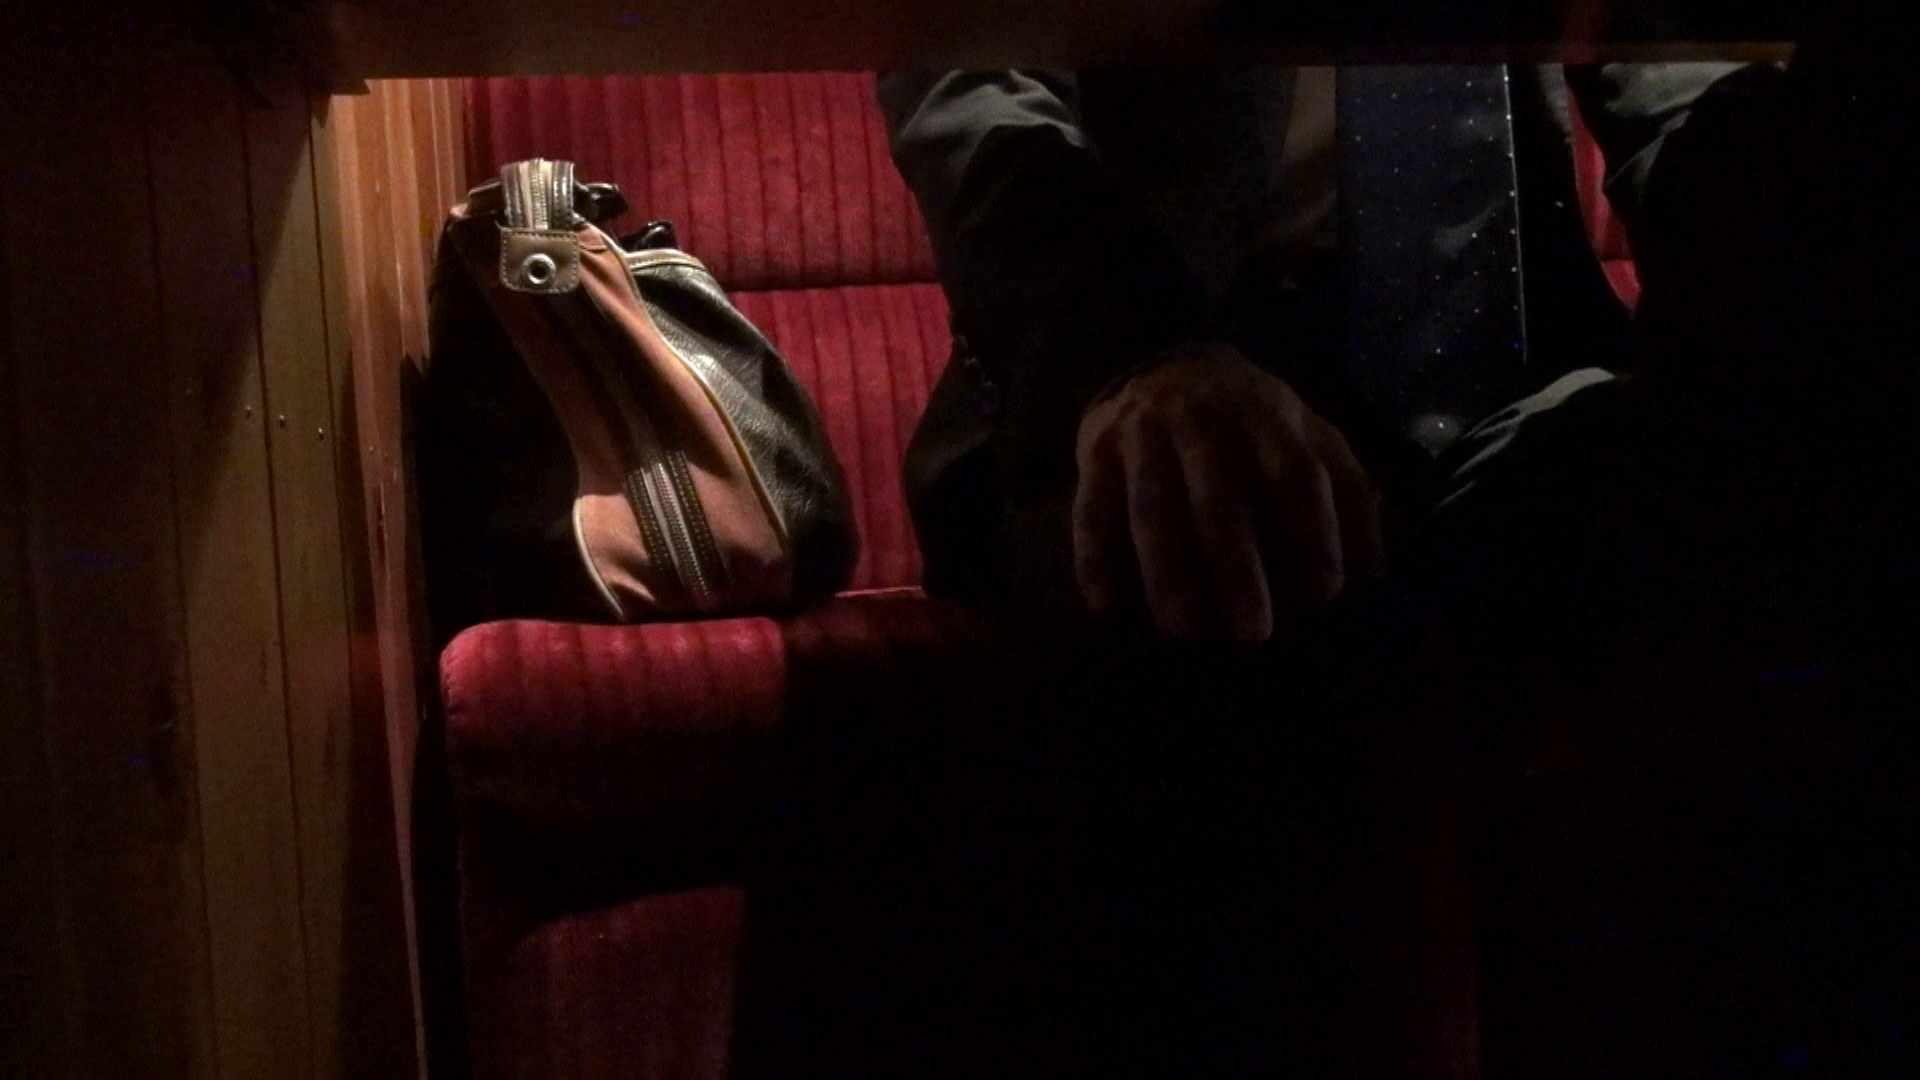 episode1 ヒロトさんと保険外交員との顔合わせ 盗撮 エロ無料画像 71pic 47